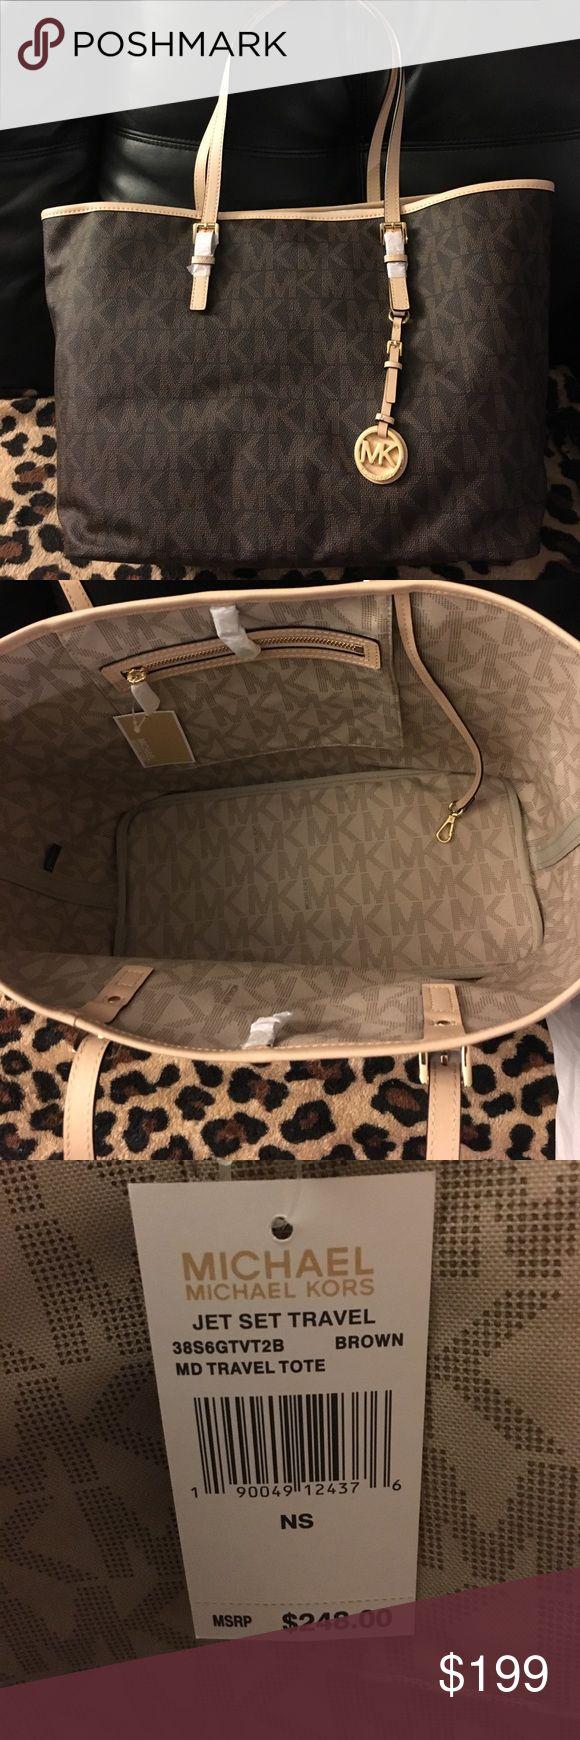 Michael Kors Large Jet Set Travel Bag Brand New with tags Michael Kors Jet Set Travel Bag! Smoke free home. Make an offer! Michael Kors Bags Travel Bags